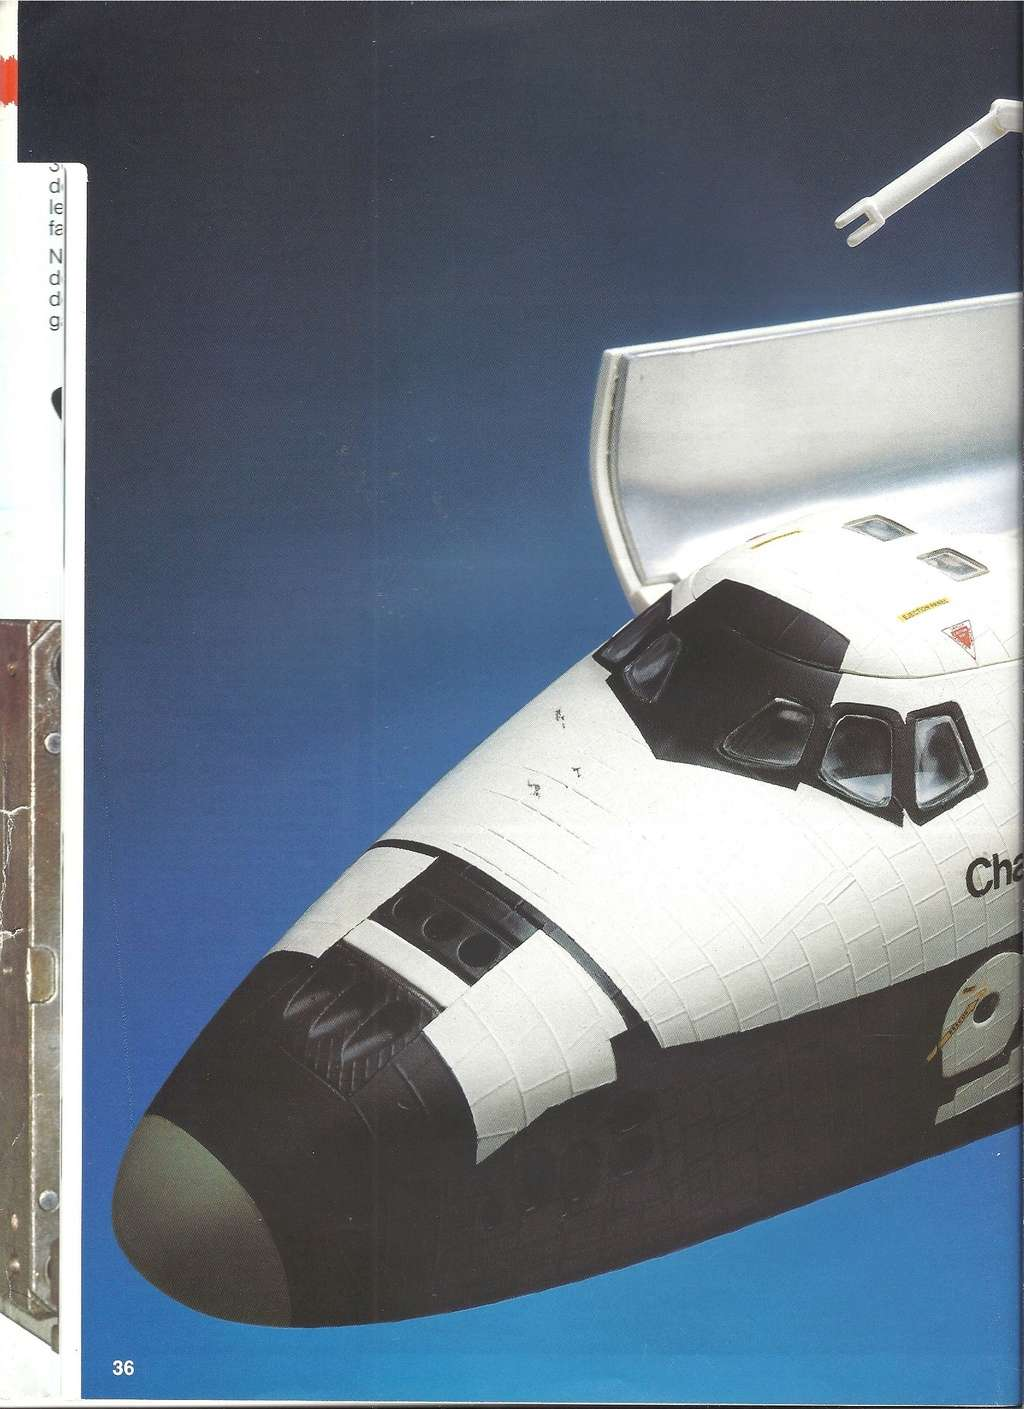 1984 - [REVELL 1984] Catalogue 1984  Revel161